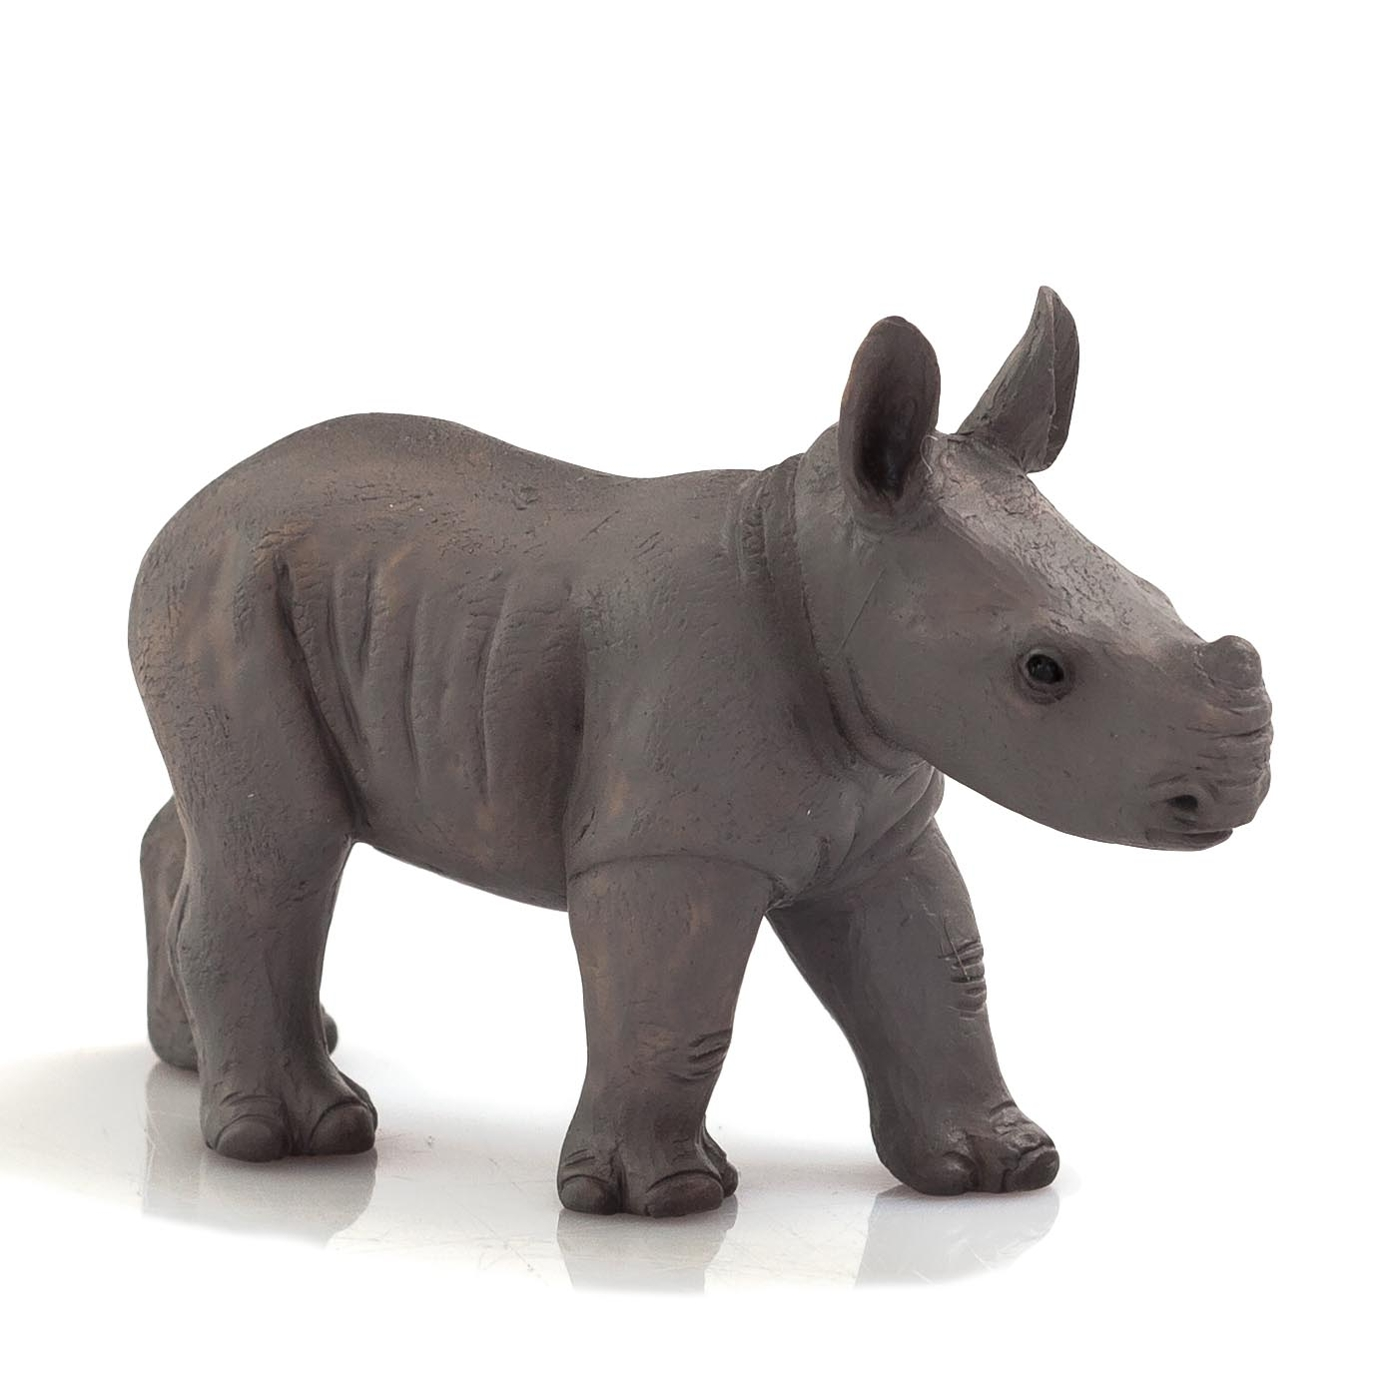 MOJO FUN動物模型動物星球頻道獨家授權-小犀牛走姿